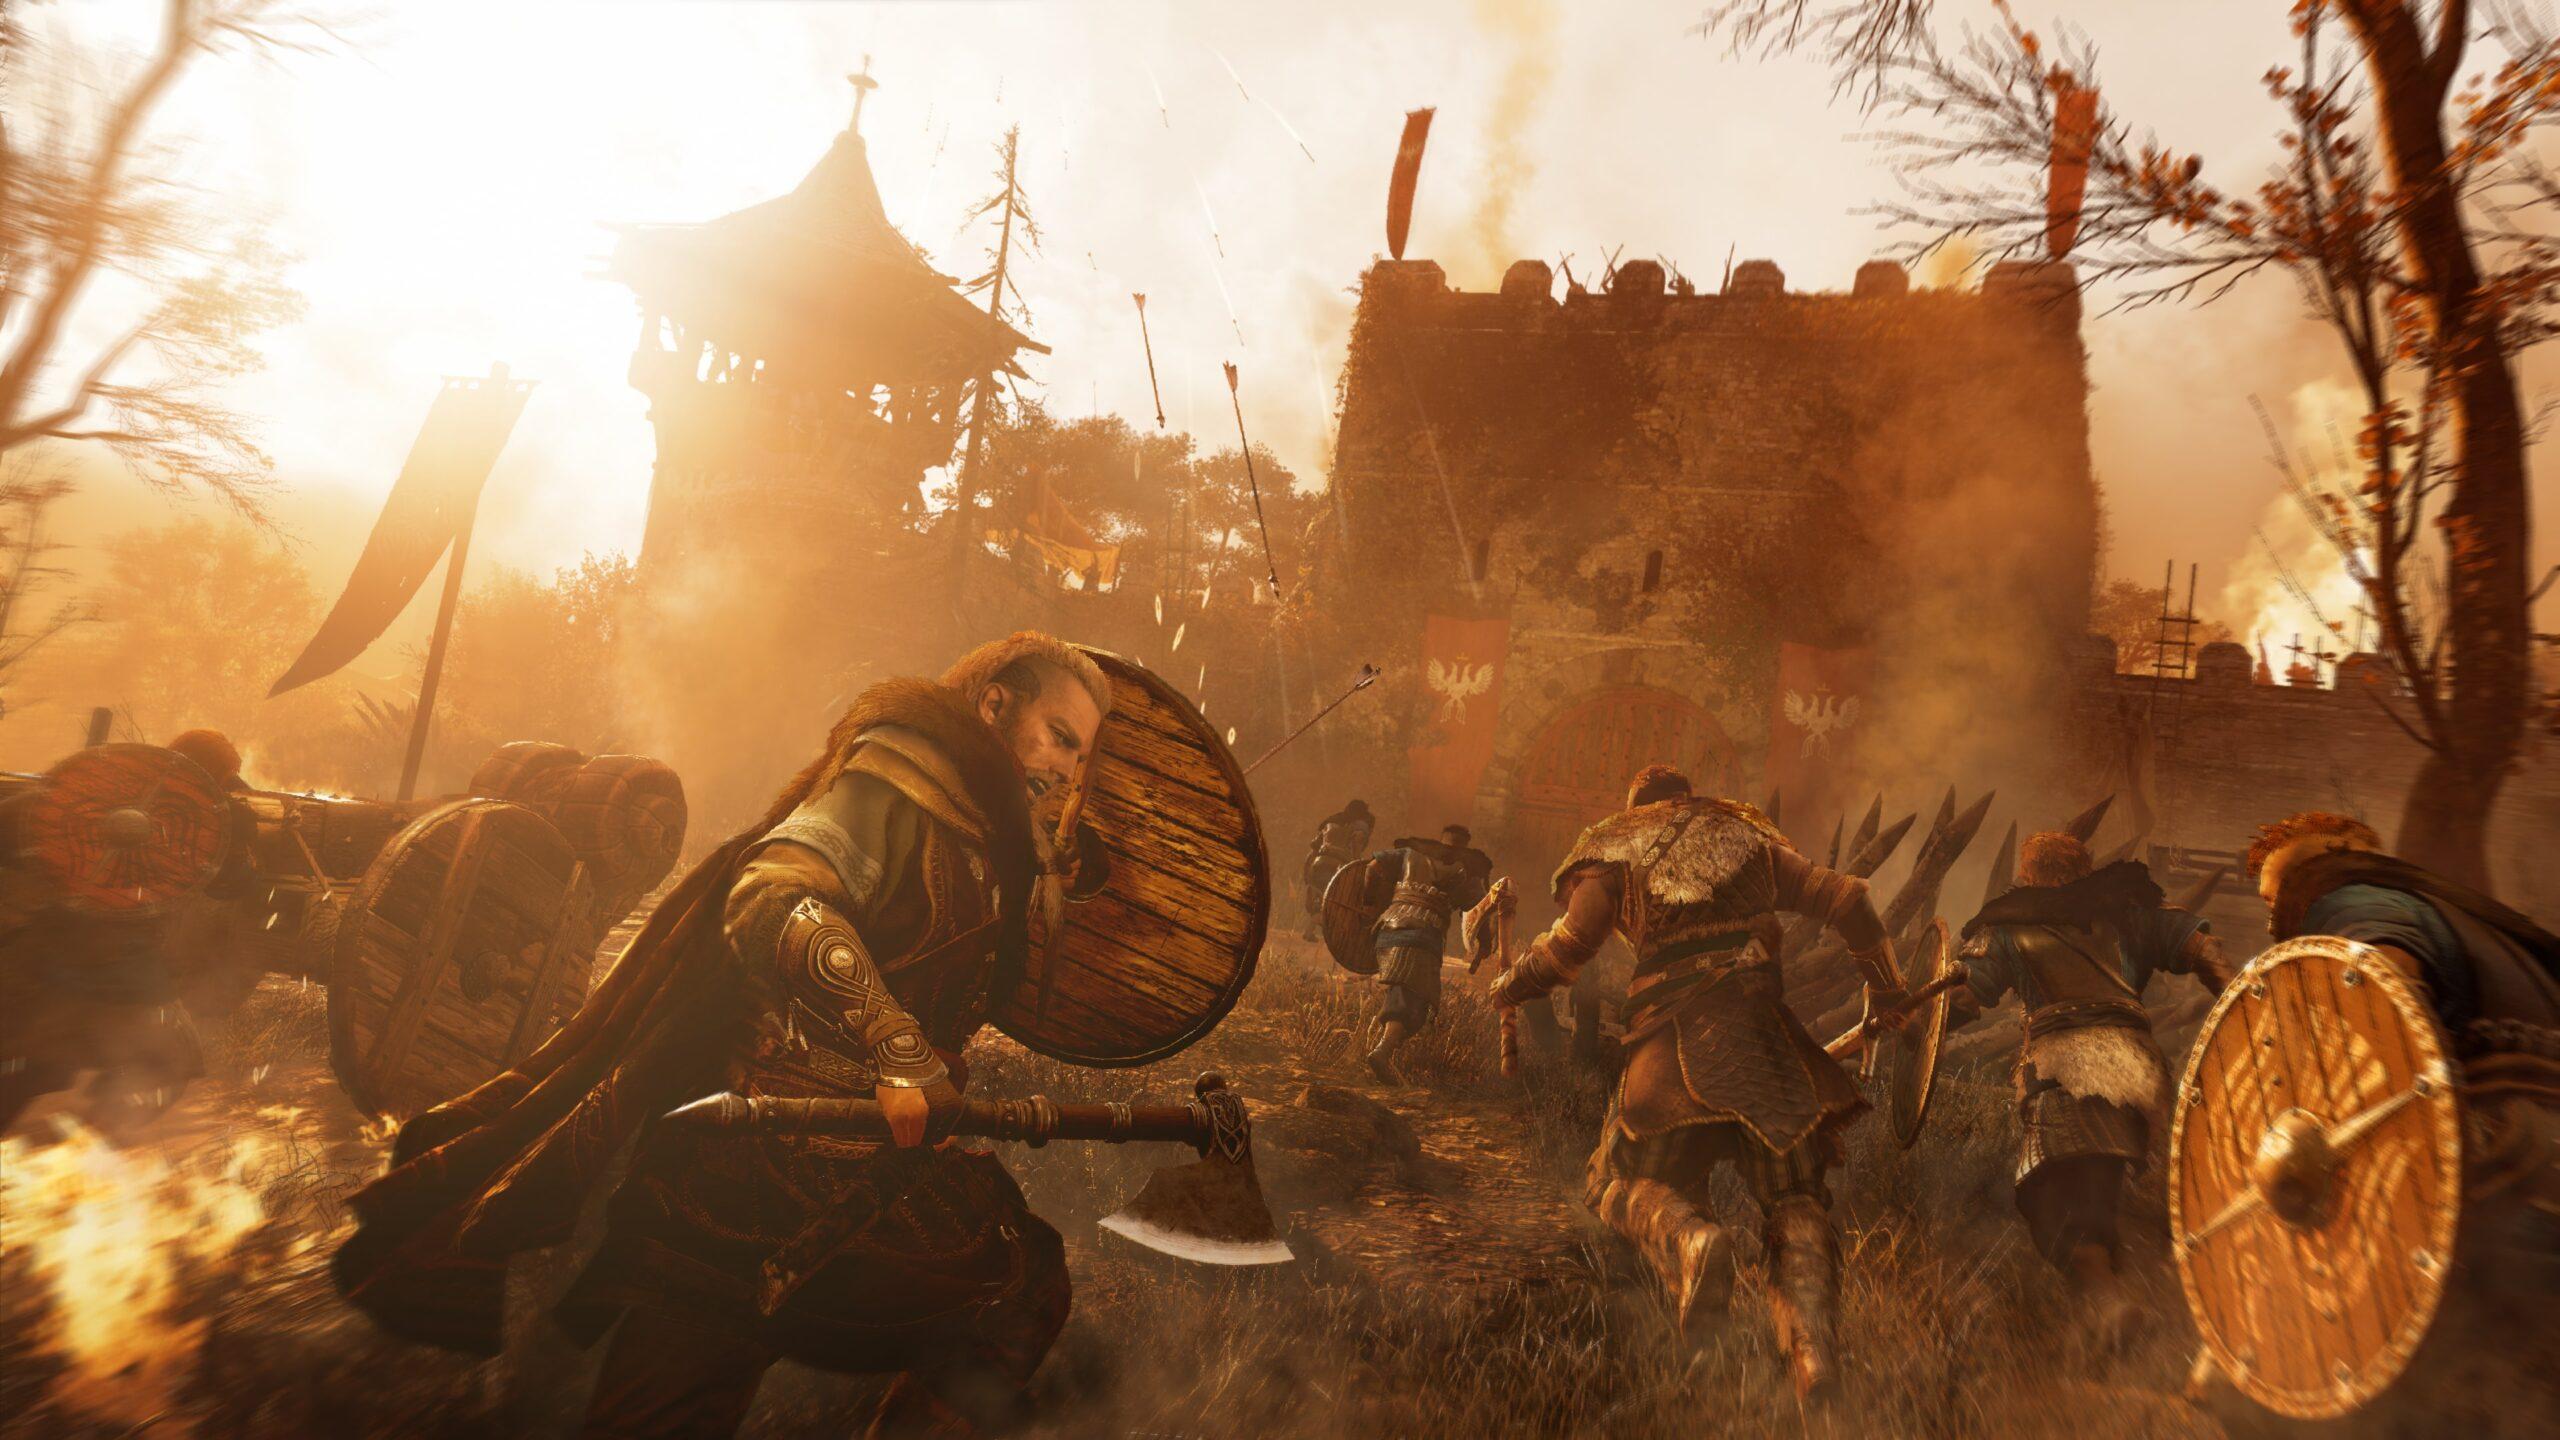 Assassins's Creed Valhalla Ubisoft